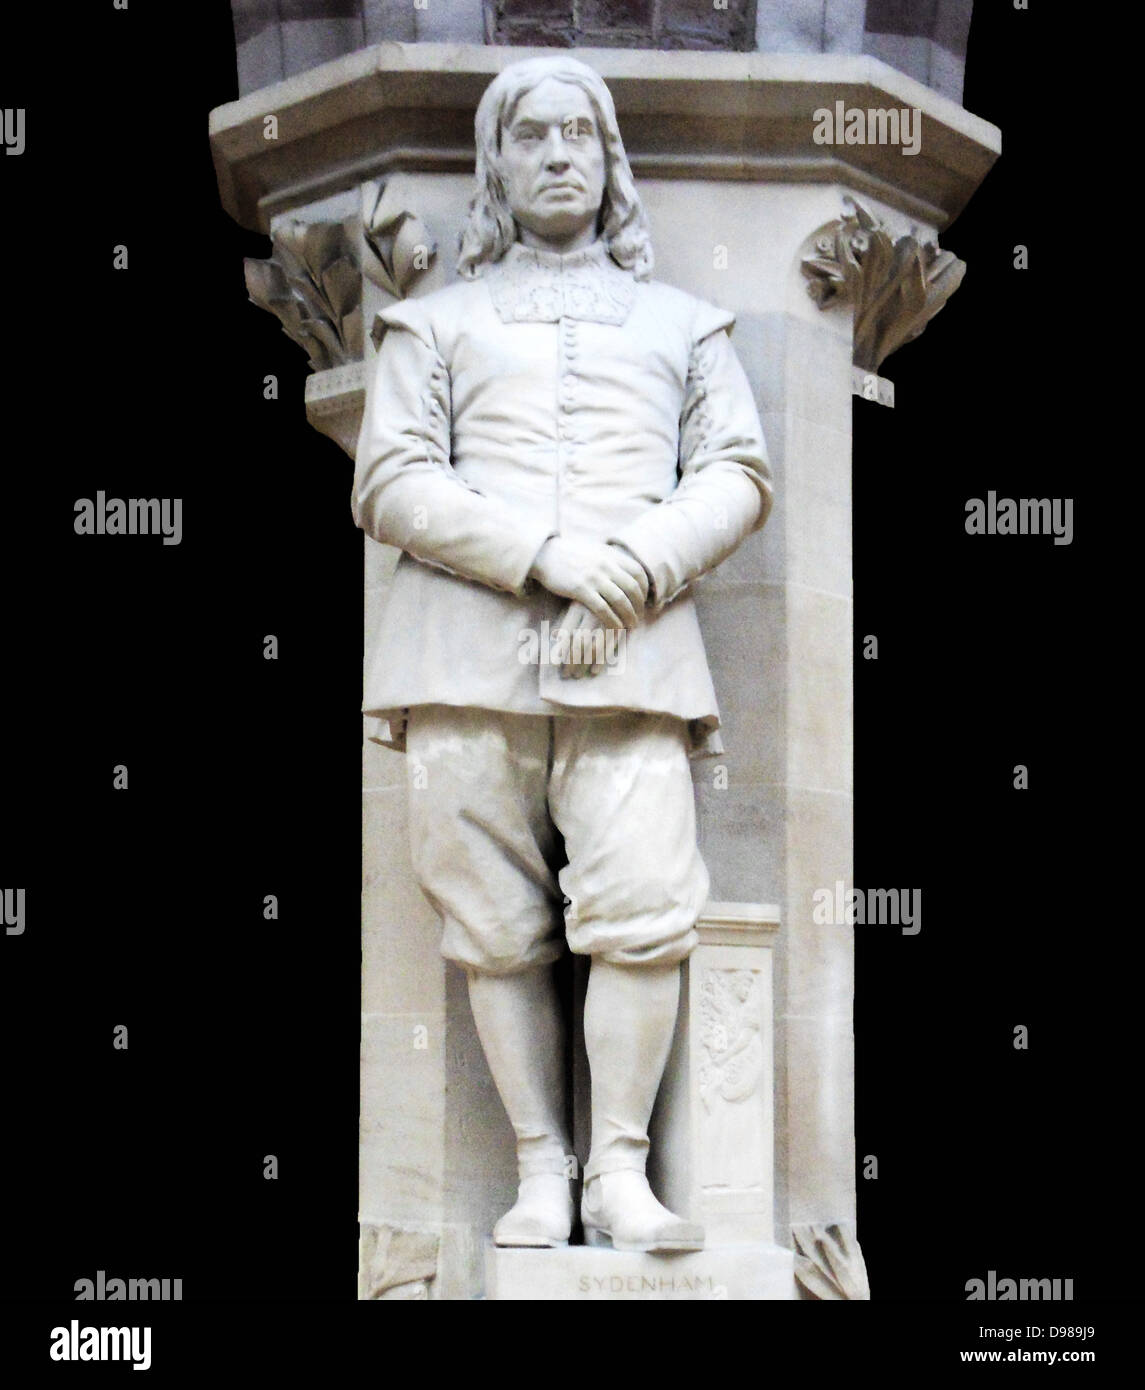 Sydenham, statue - Stock Image